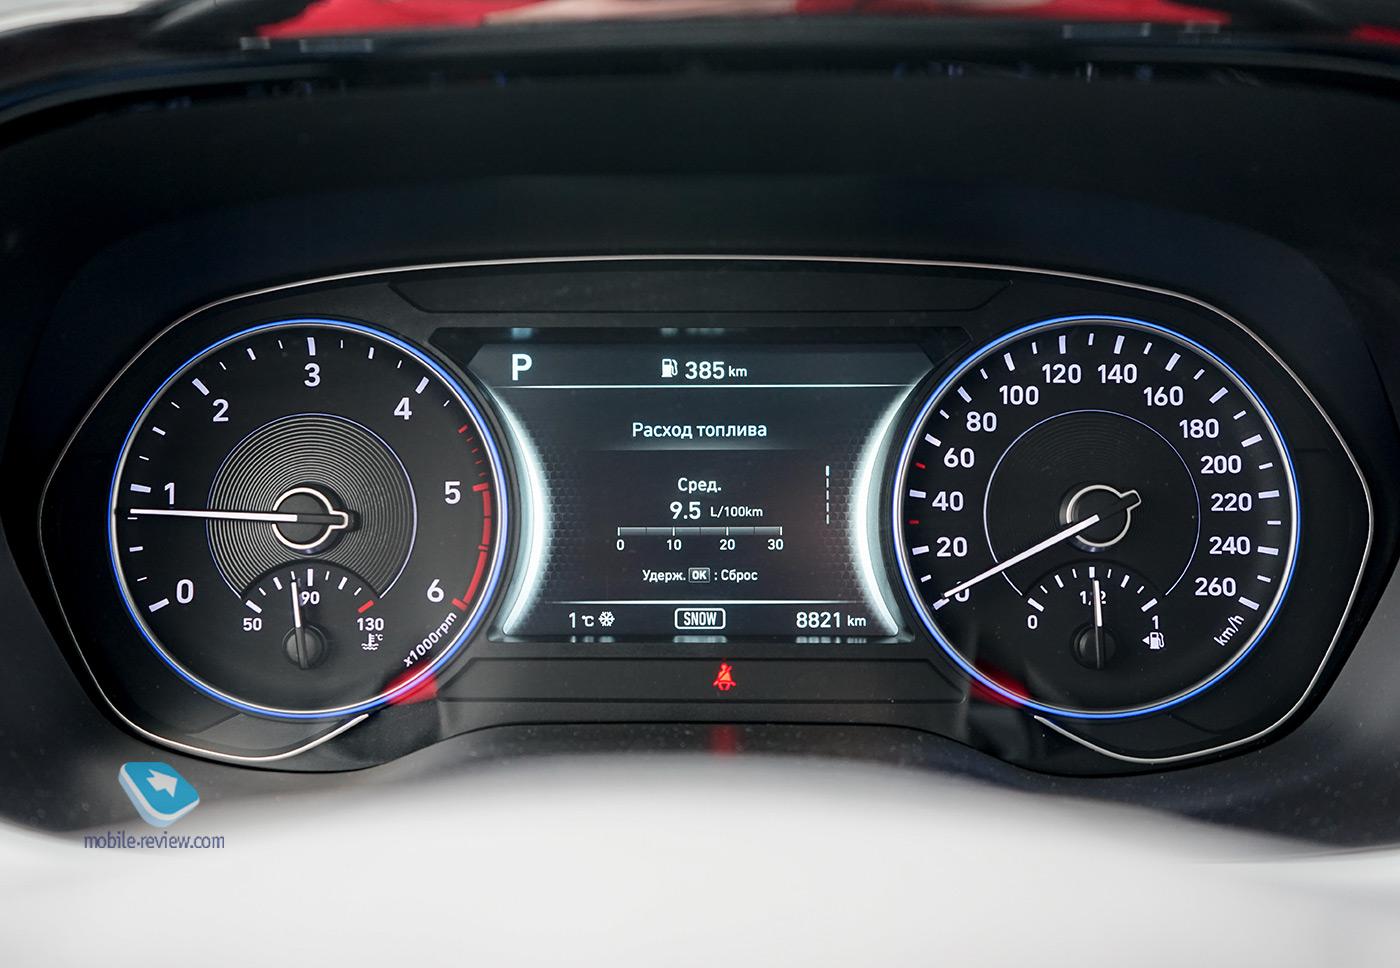 Тест Hyundai Palisade. American Dream